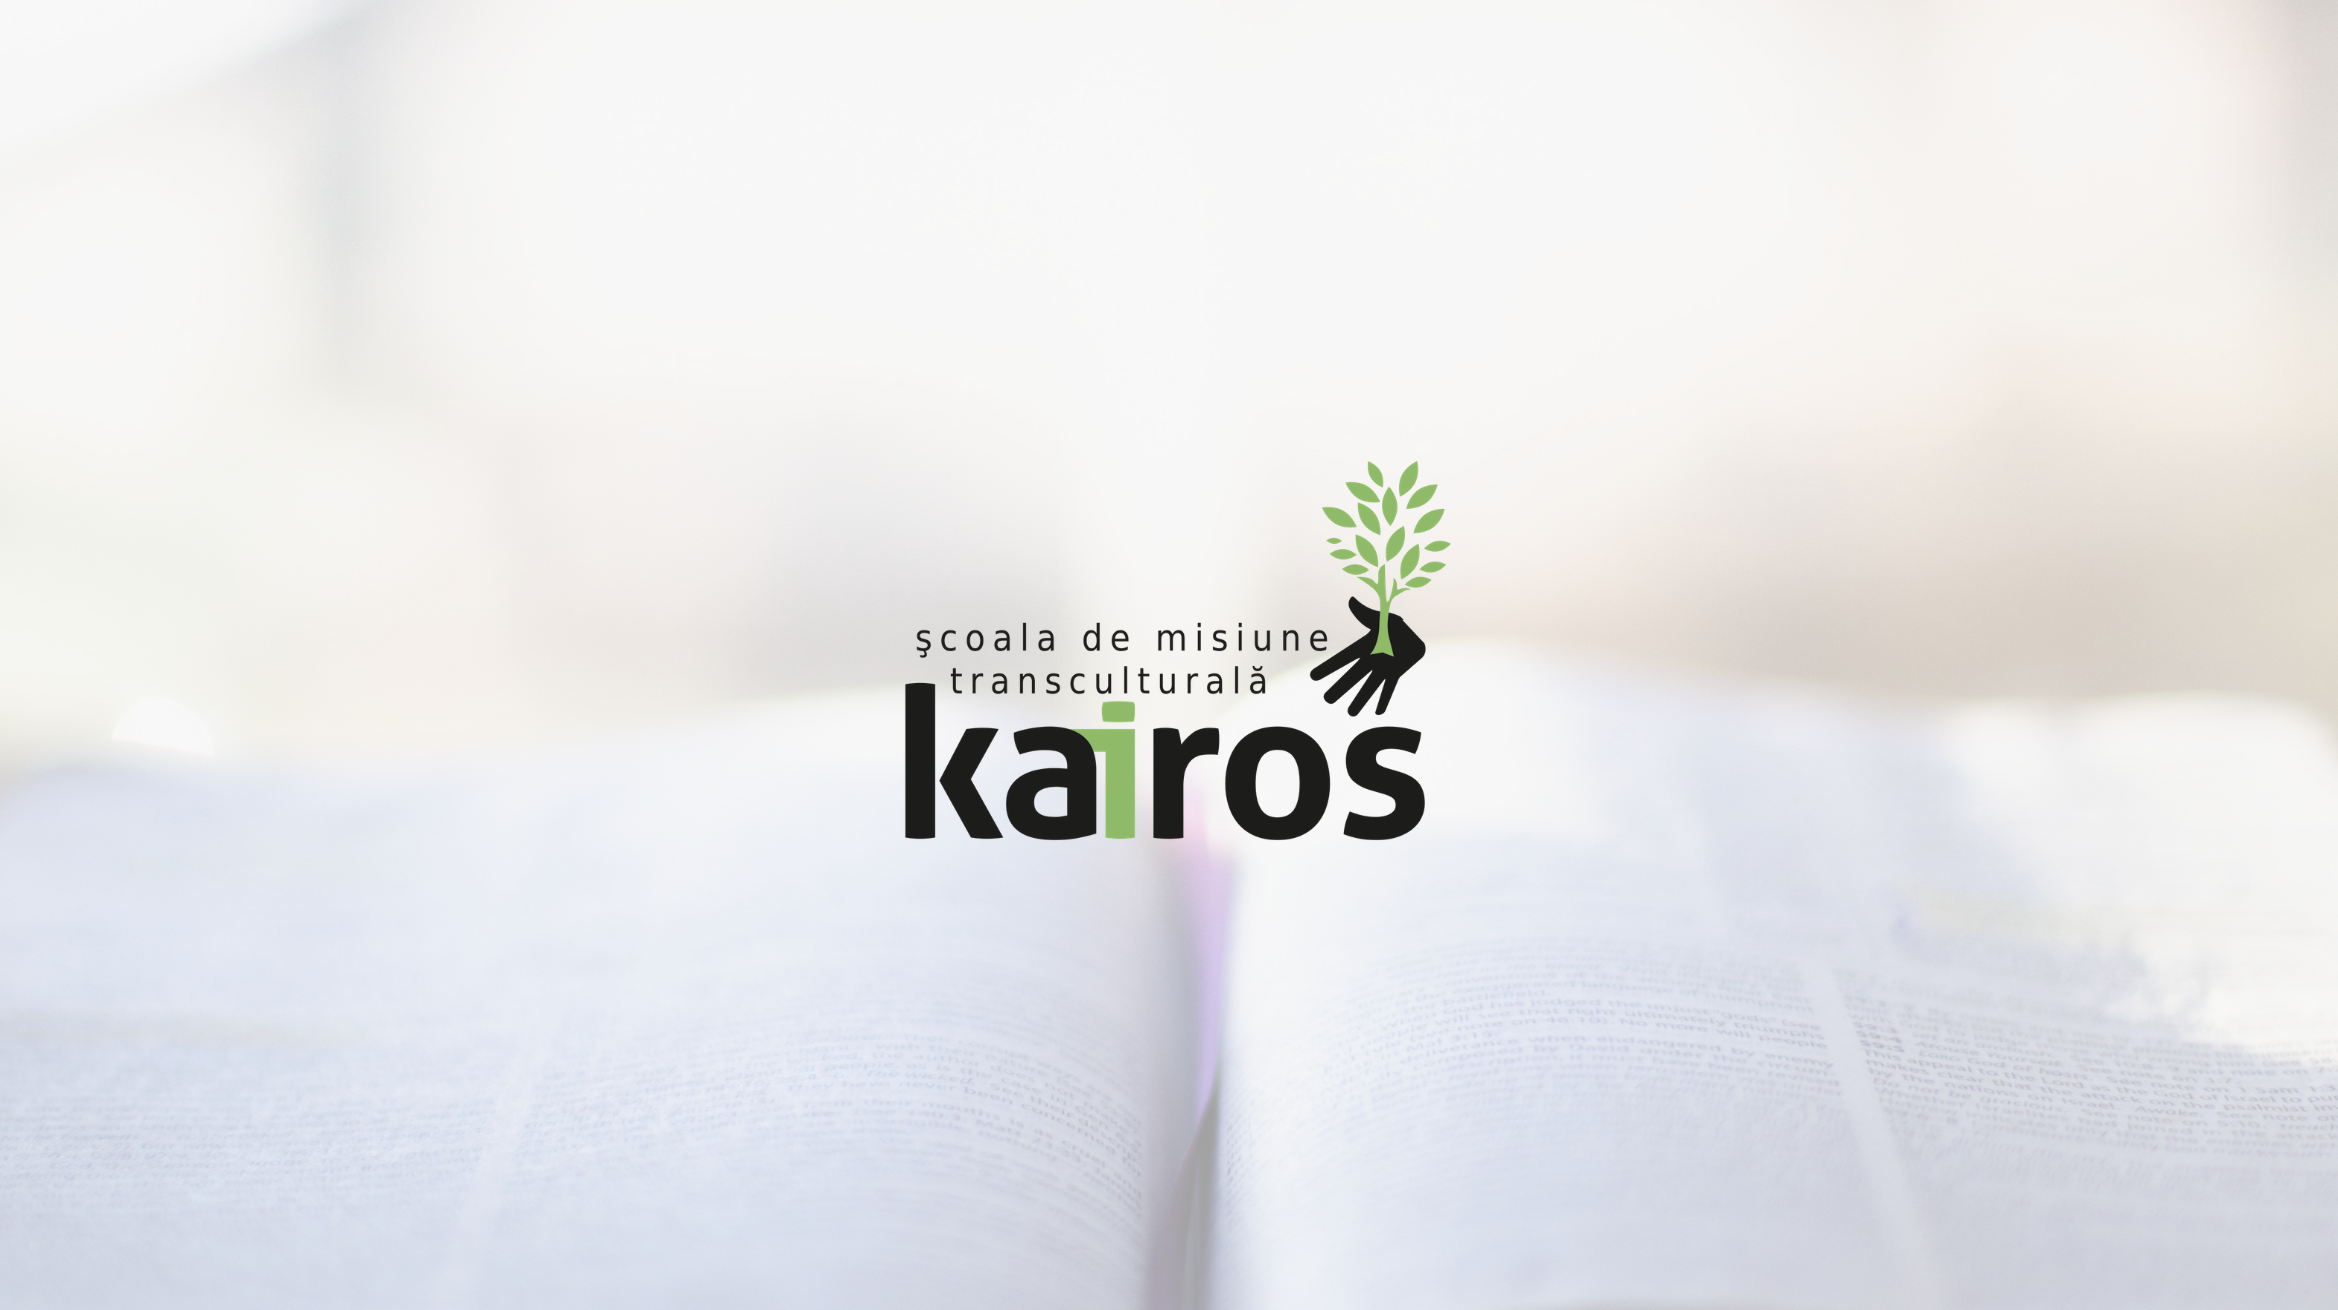 Imagini pentru scoala de misiune kairos 2019